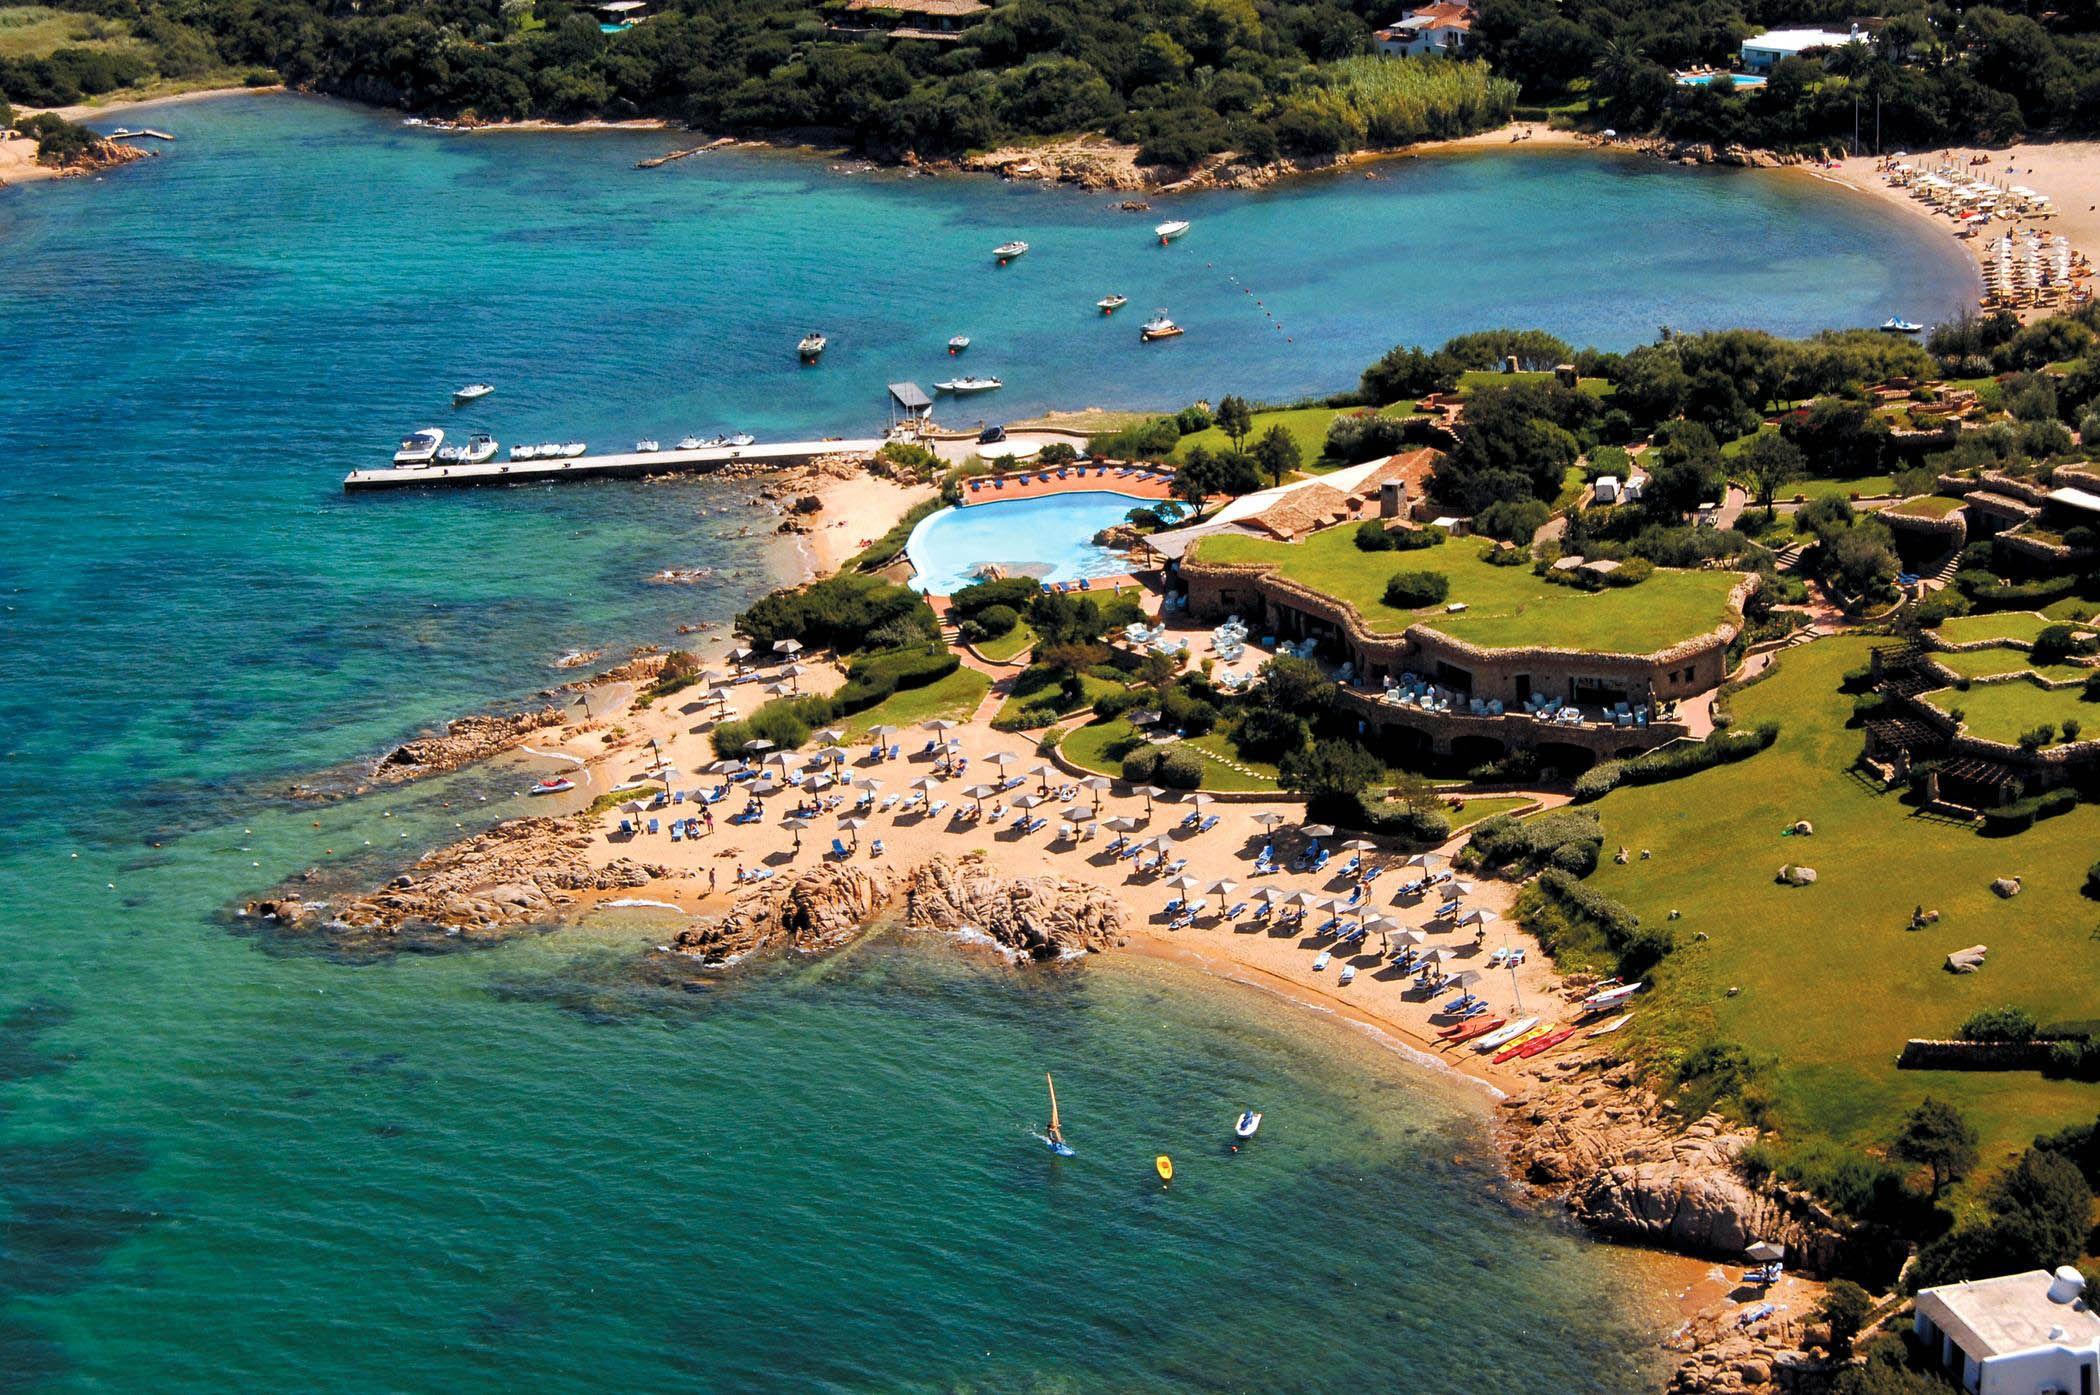 Hotel Pitrizza Sardinia Italysardinia Hotelsbeach Hotelsluxury